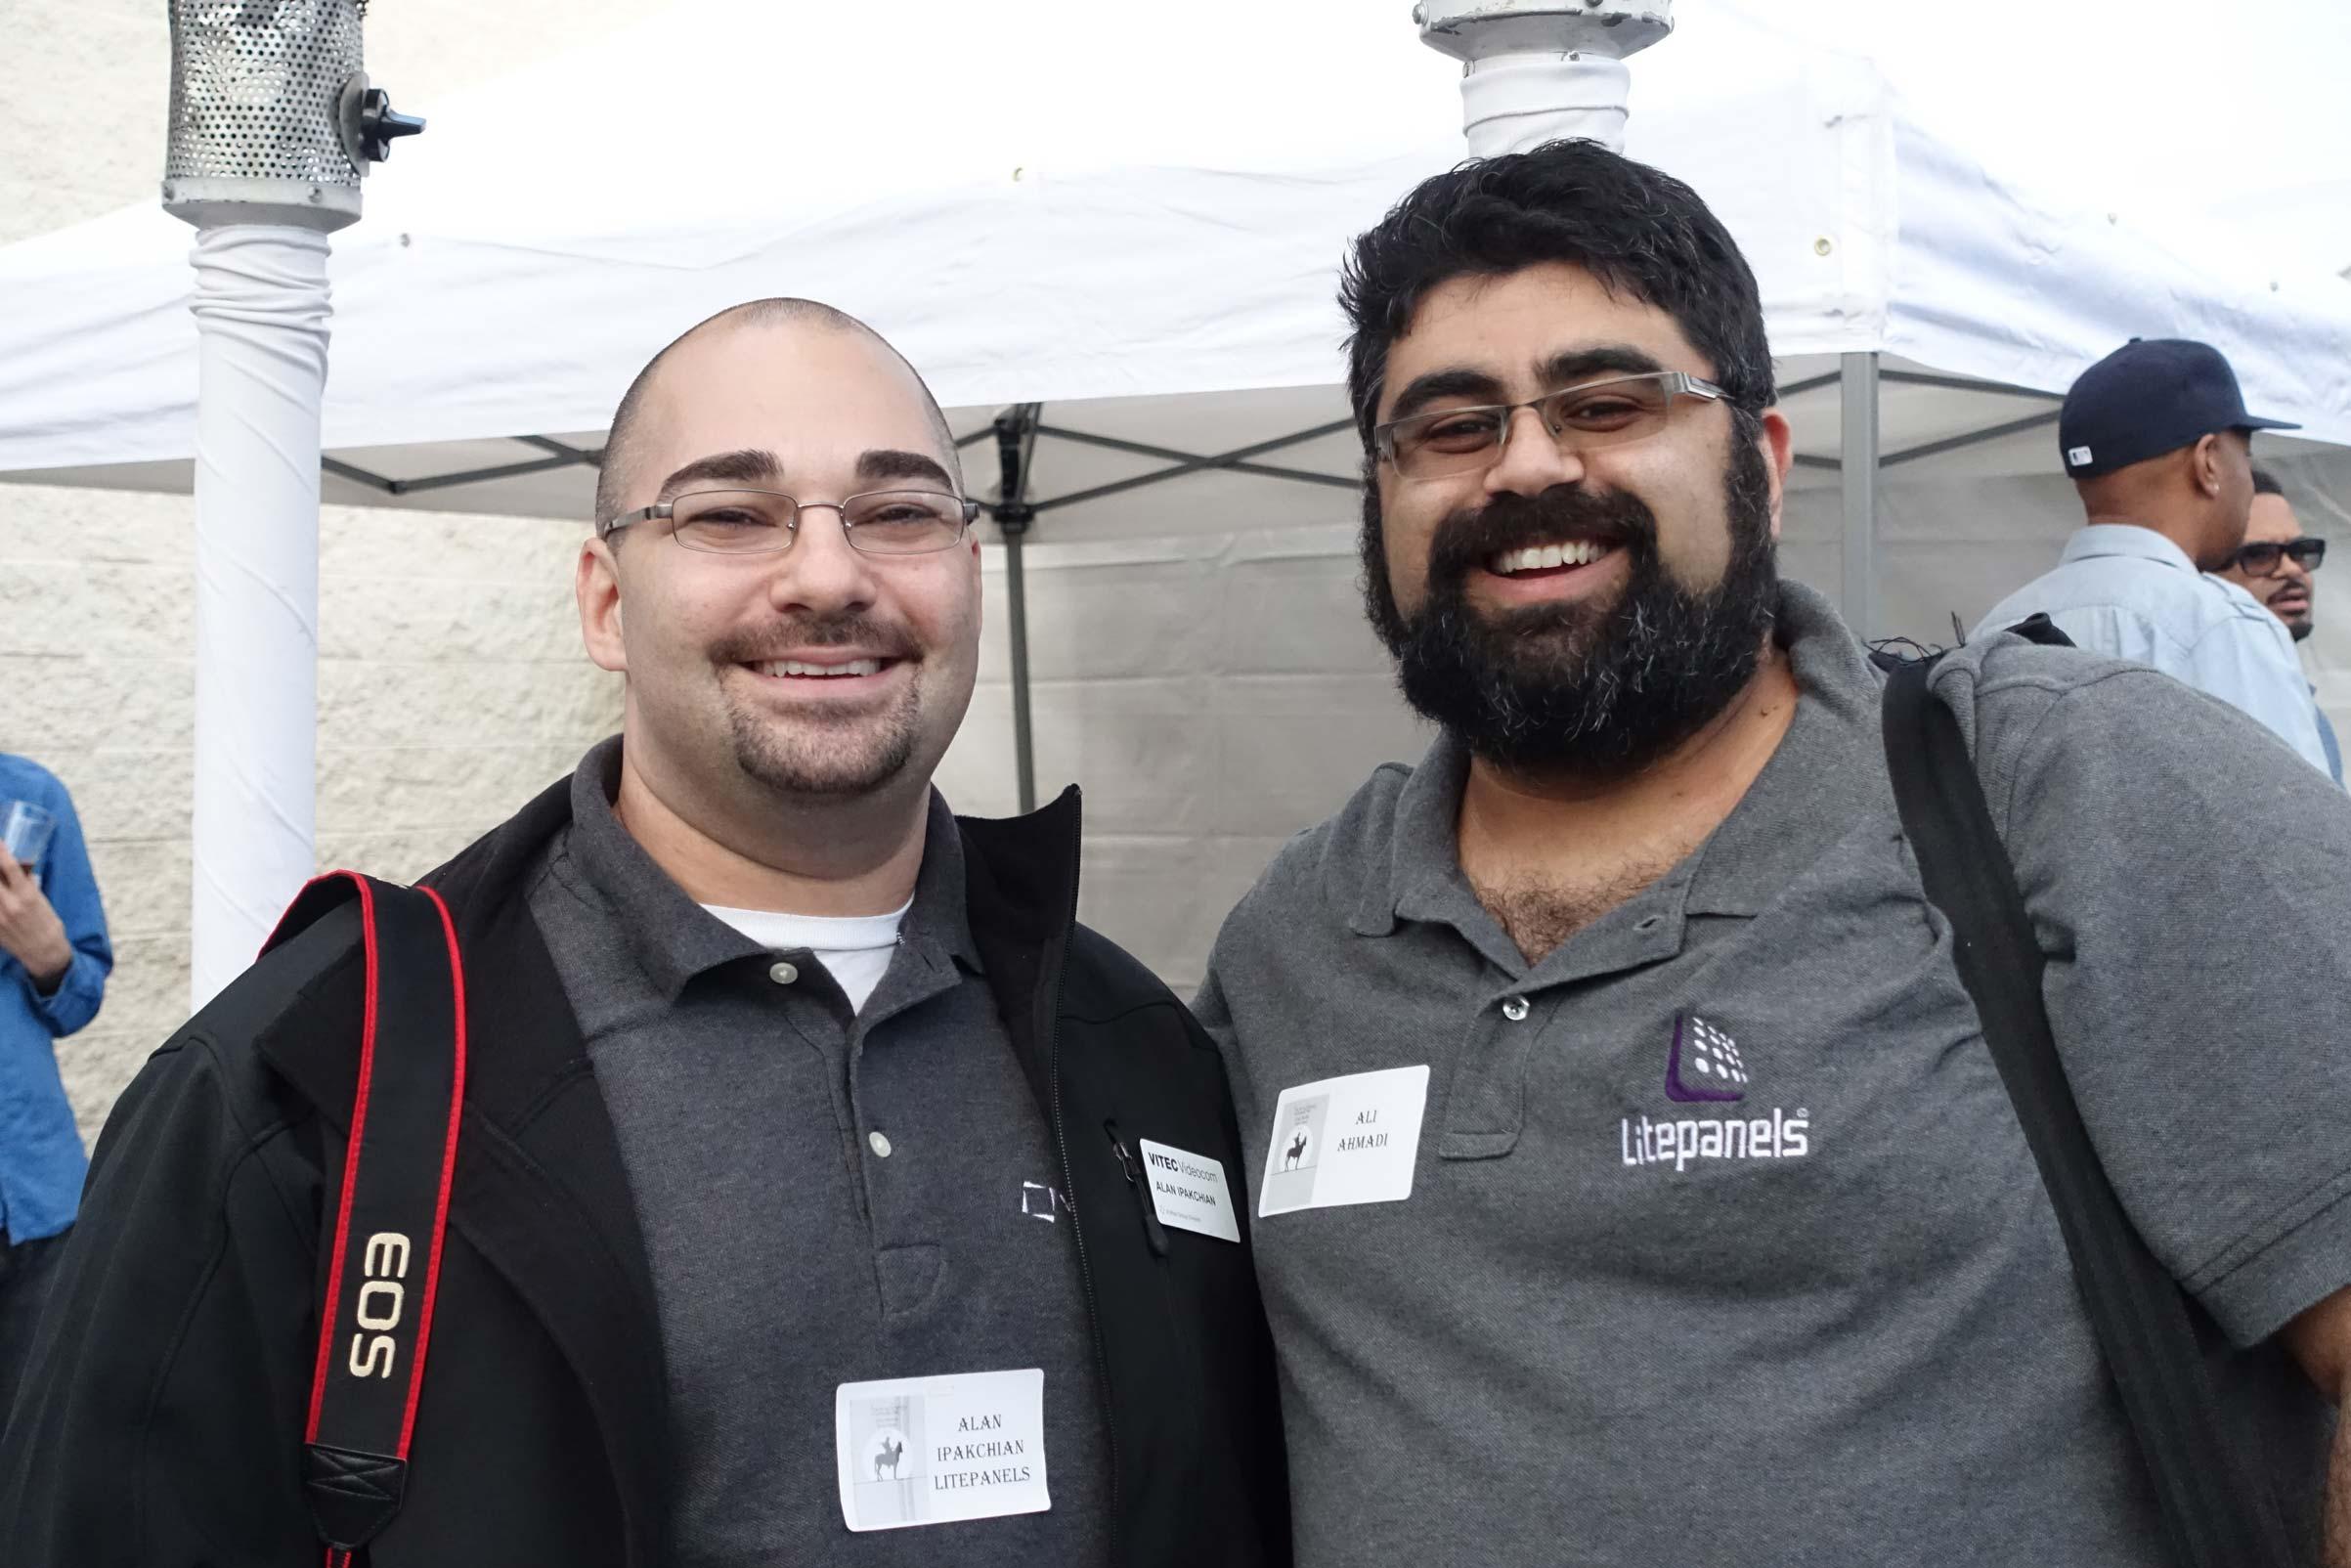 Litepanel's Alan Ipakchian and Ali Ahmadi